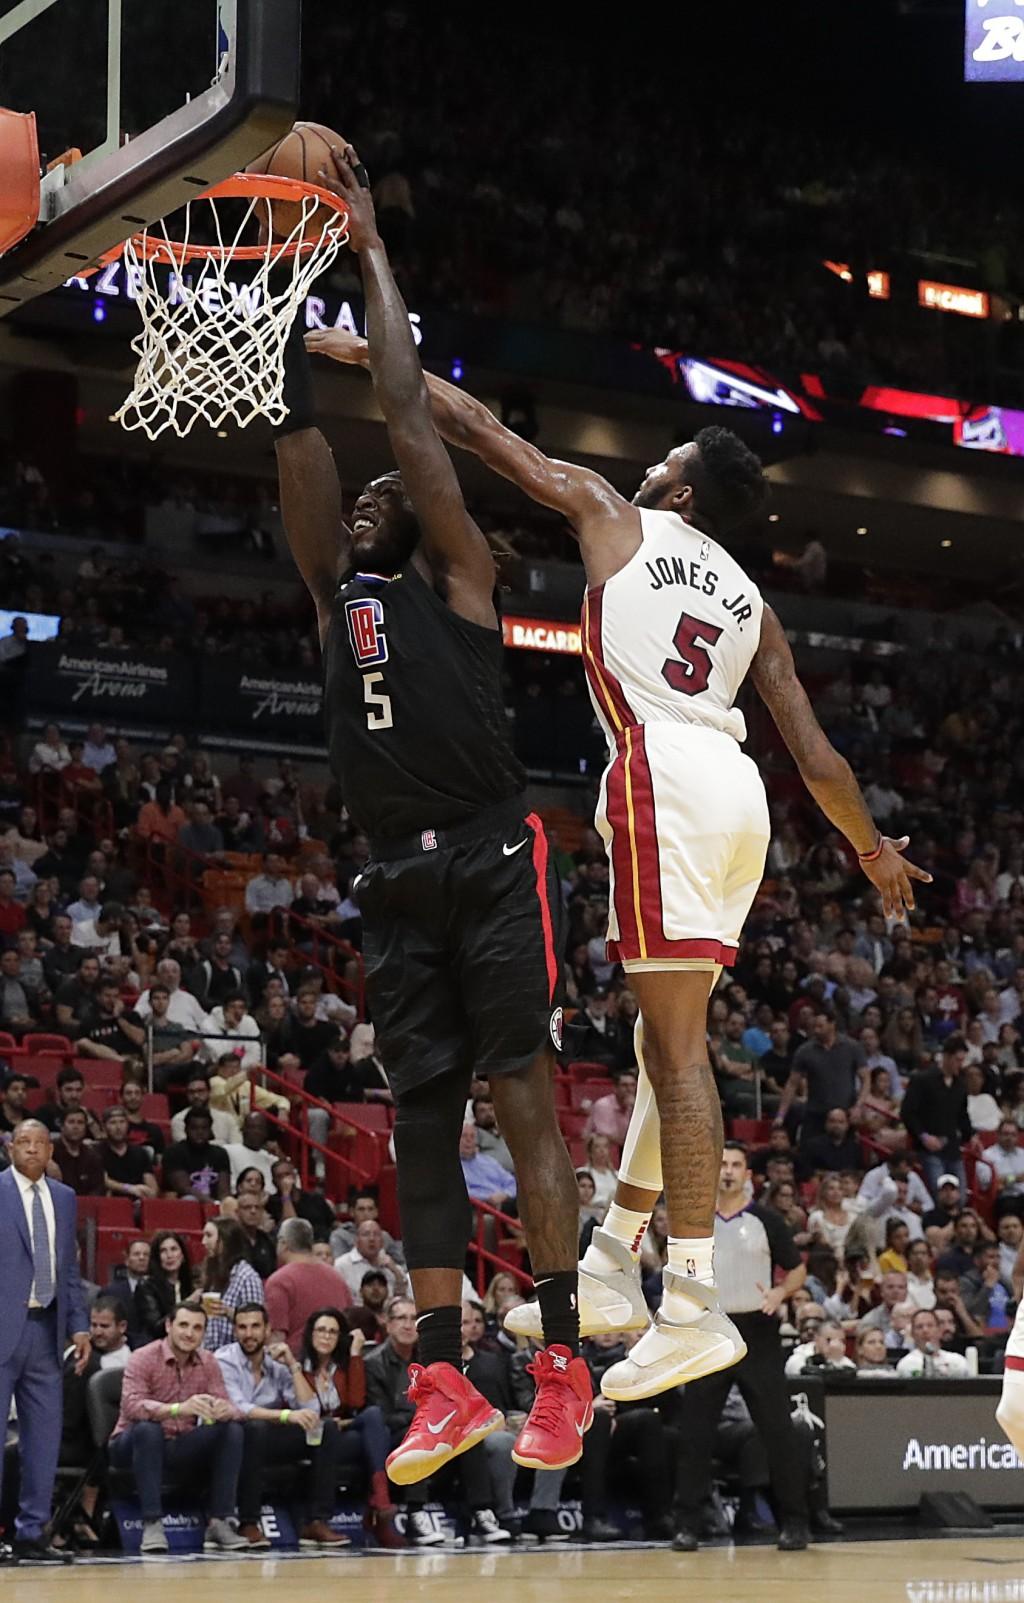 Los Angeles Clippers forward Montrezl Harrell dunks the ball against Miami Heat forward Derrick Jones Jr. (5) during the first half of an NBA basketba...